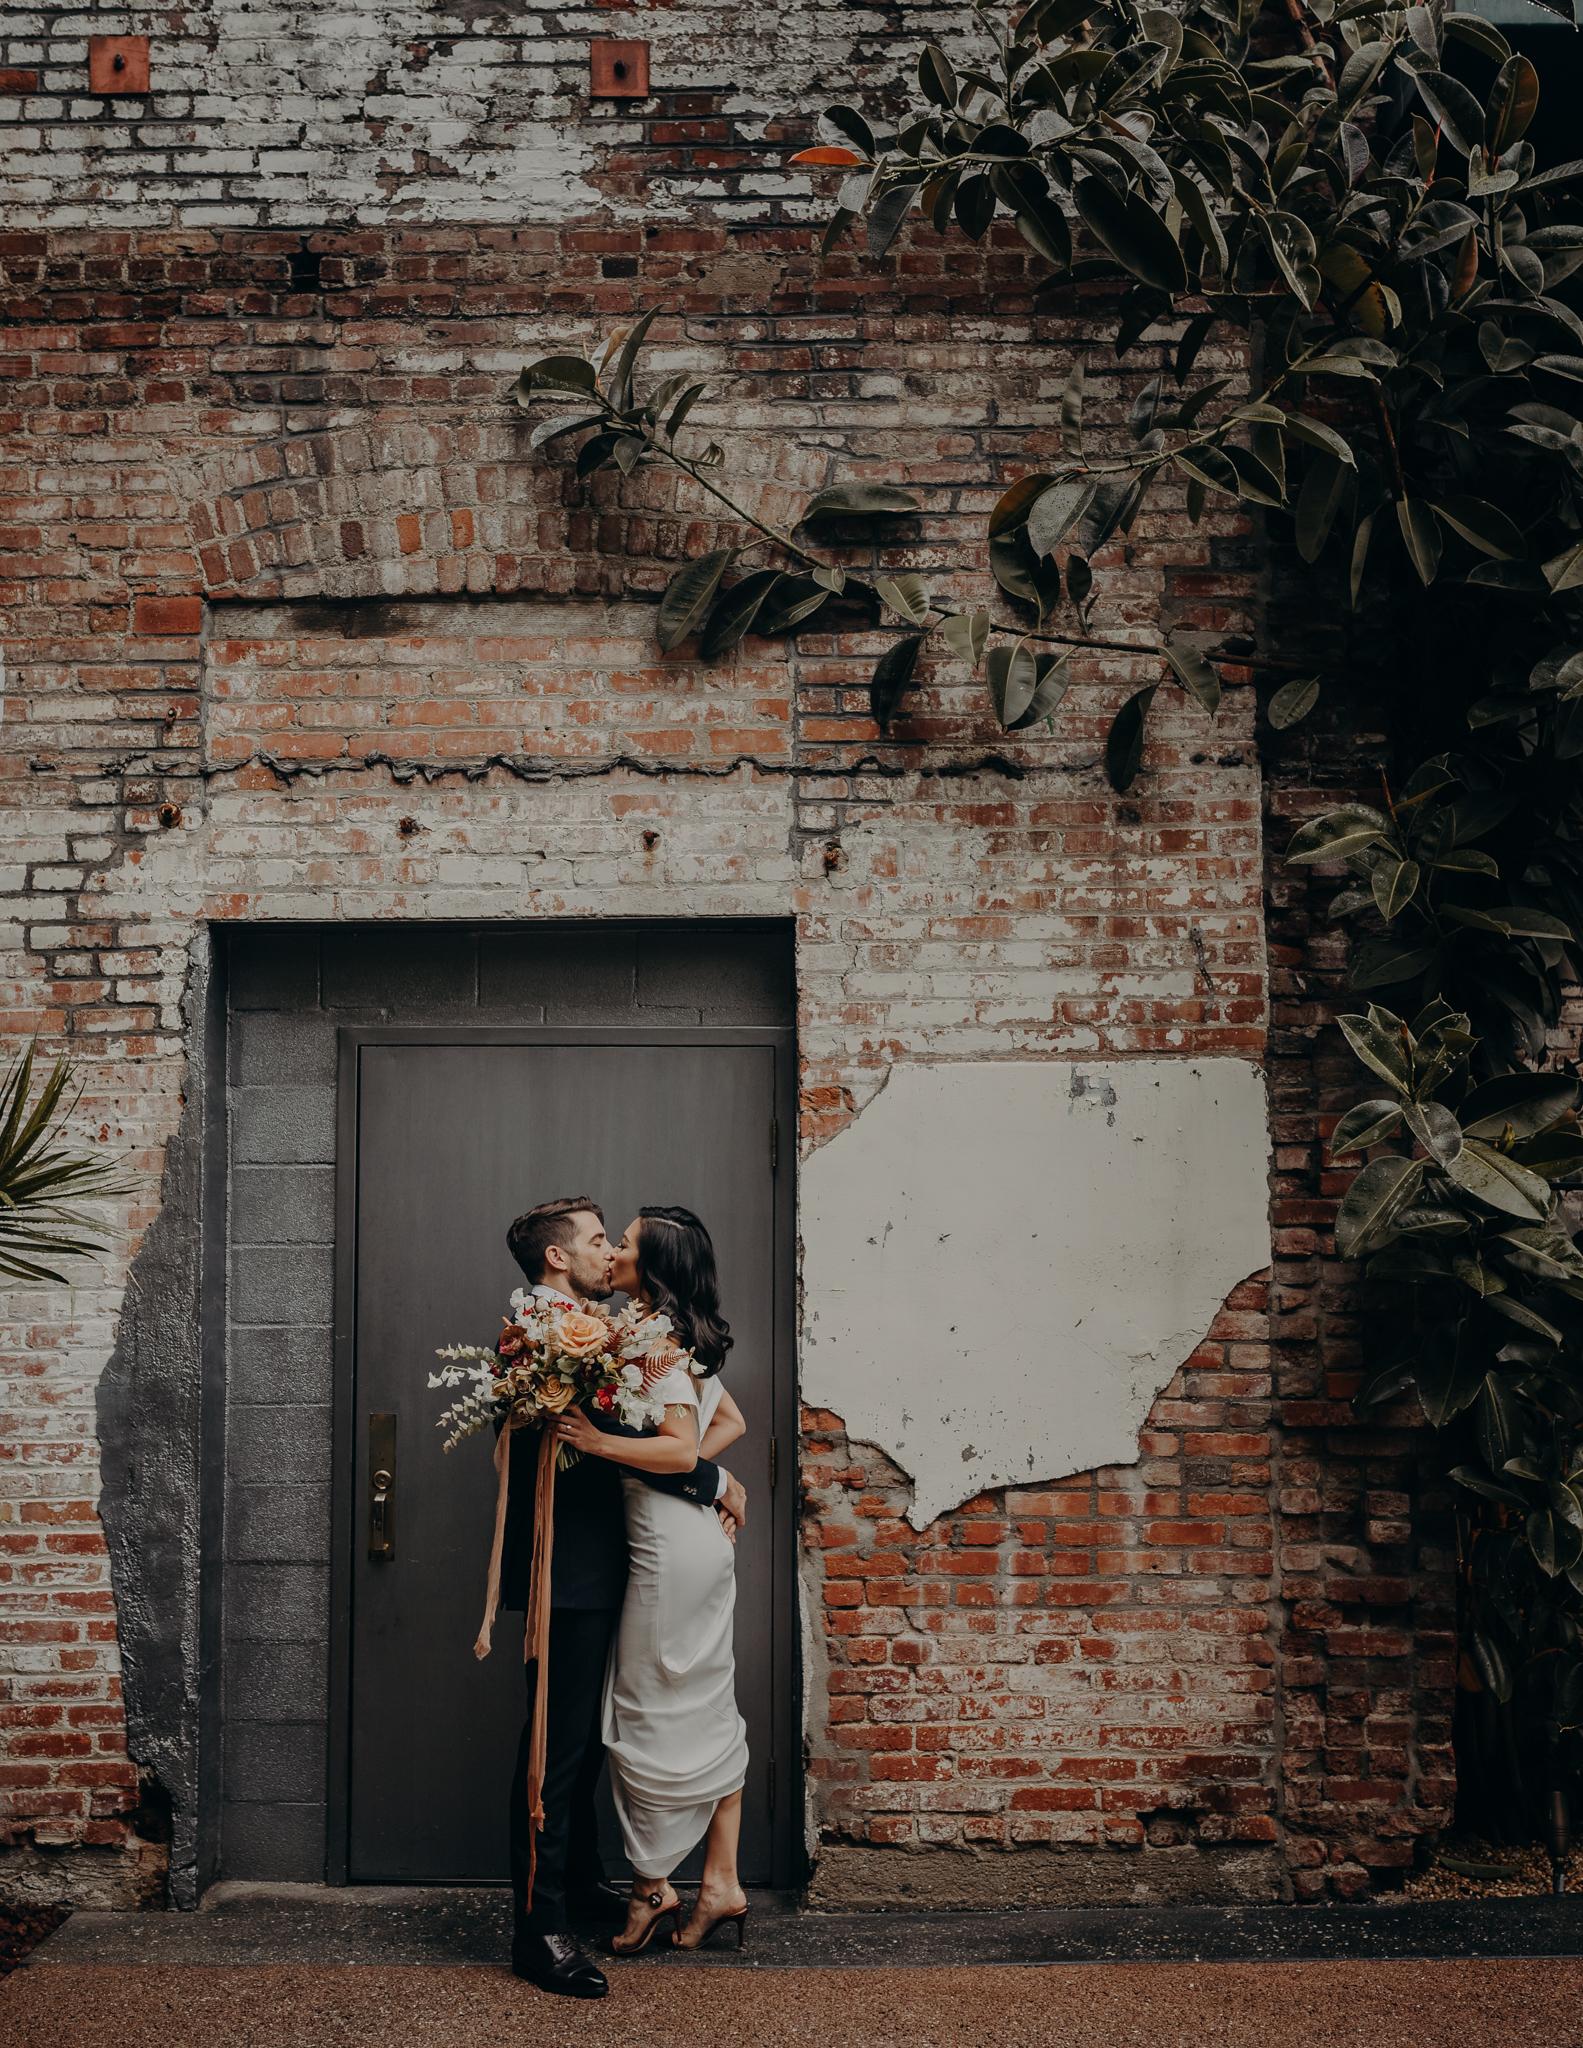 - los angeles wedding photographer - wedding photographer in long beach - LGBTQ wedding photographer - isaiahandtaylor.com